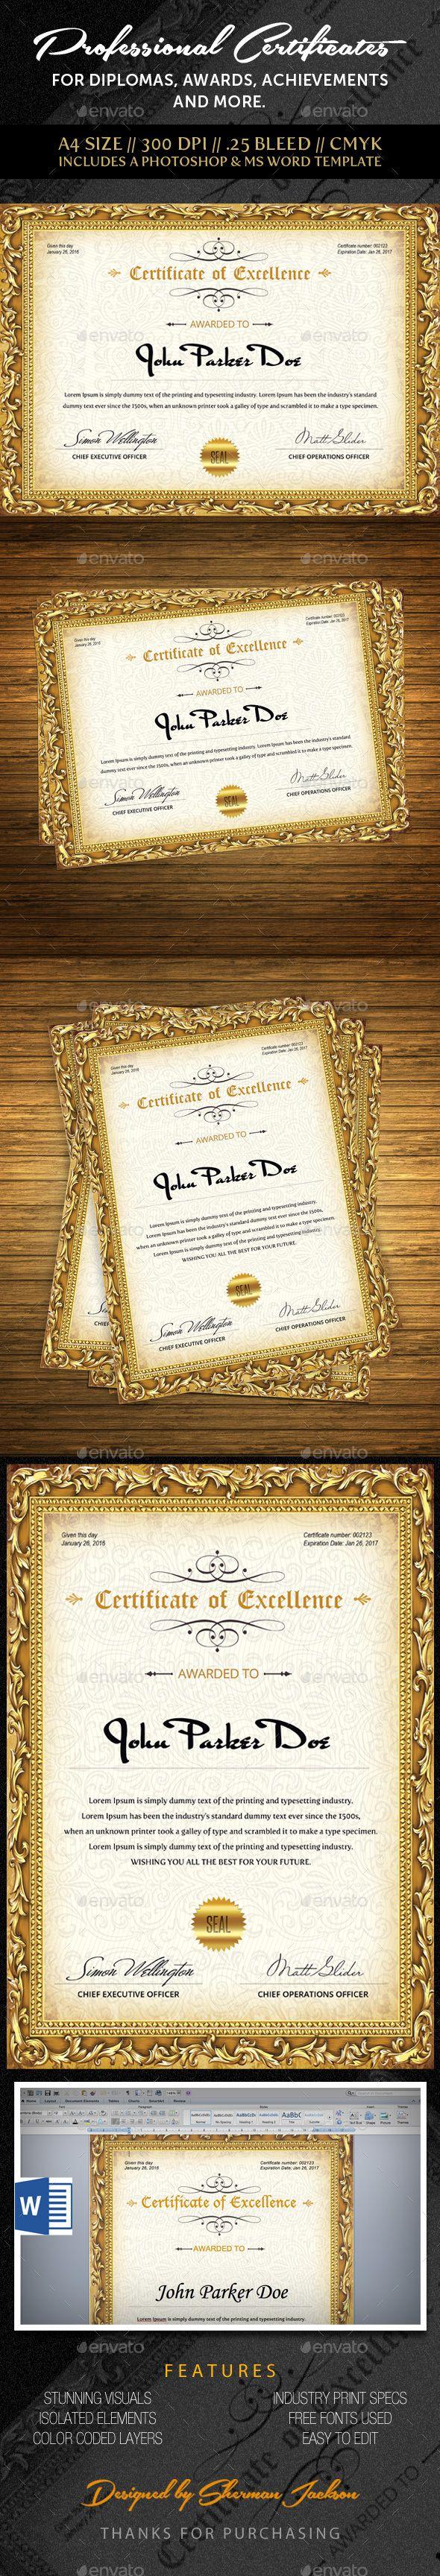 Best 25 certificate design template ideas on pinterest multipurpose professional certificate certificate designcertificate templatesgraphic design templatespsd xflitez Image collections